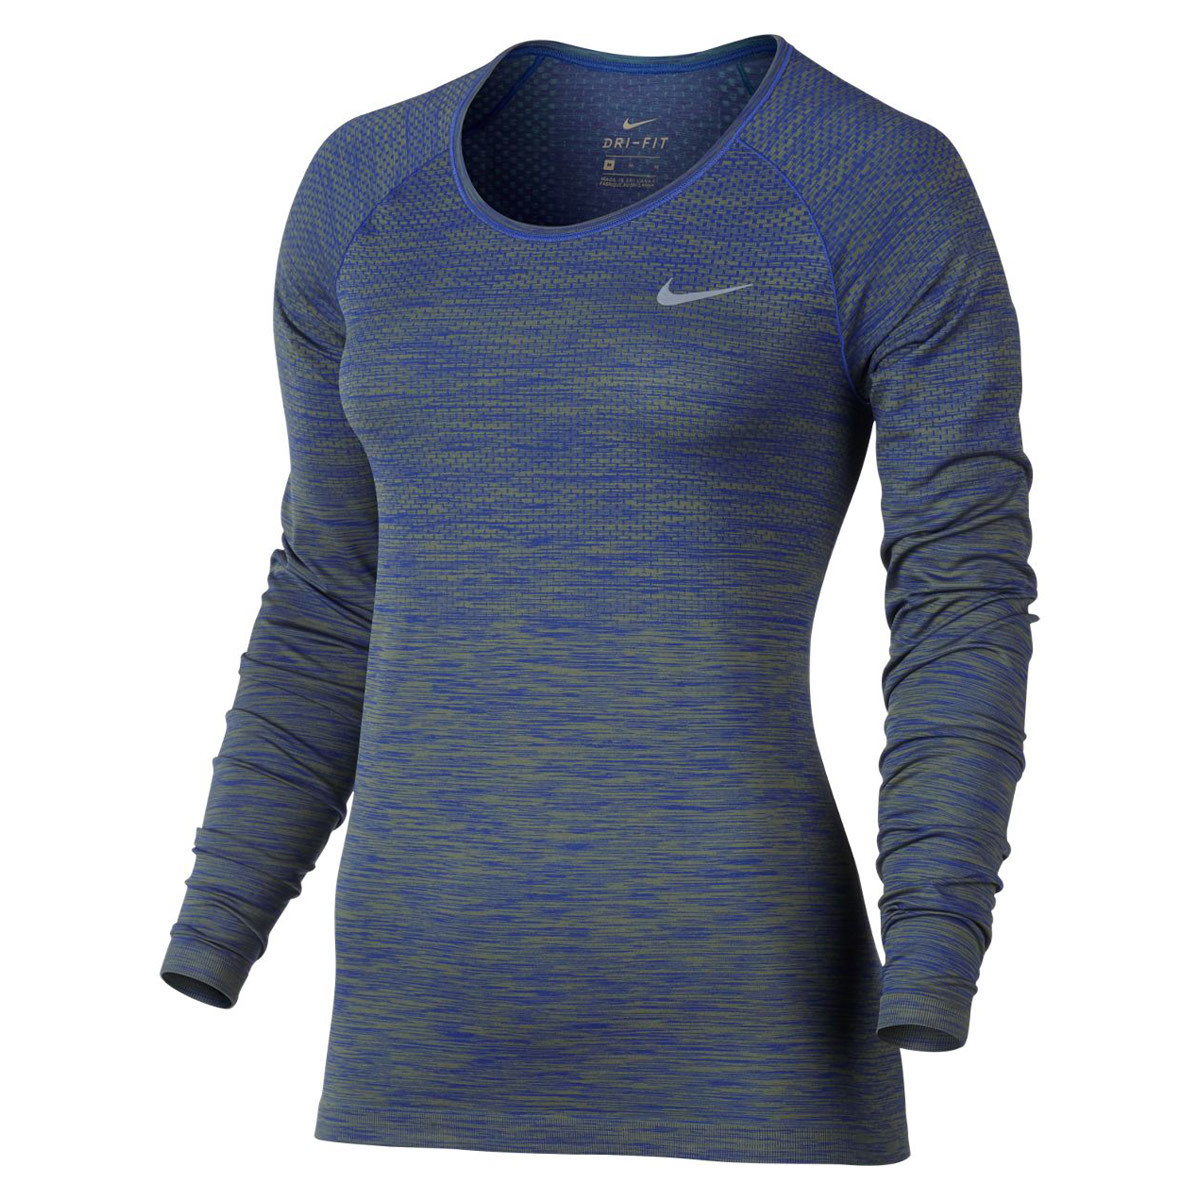 Para De Mujer Fit Nike Camisetas Azul Running Dri Knit Tee 4cL3qSARj5